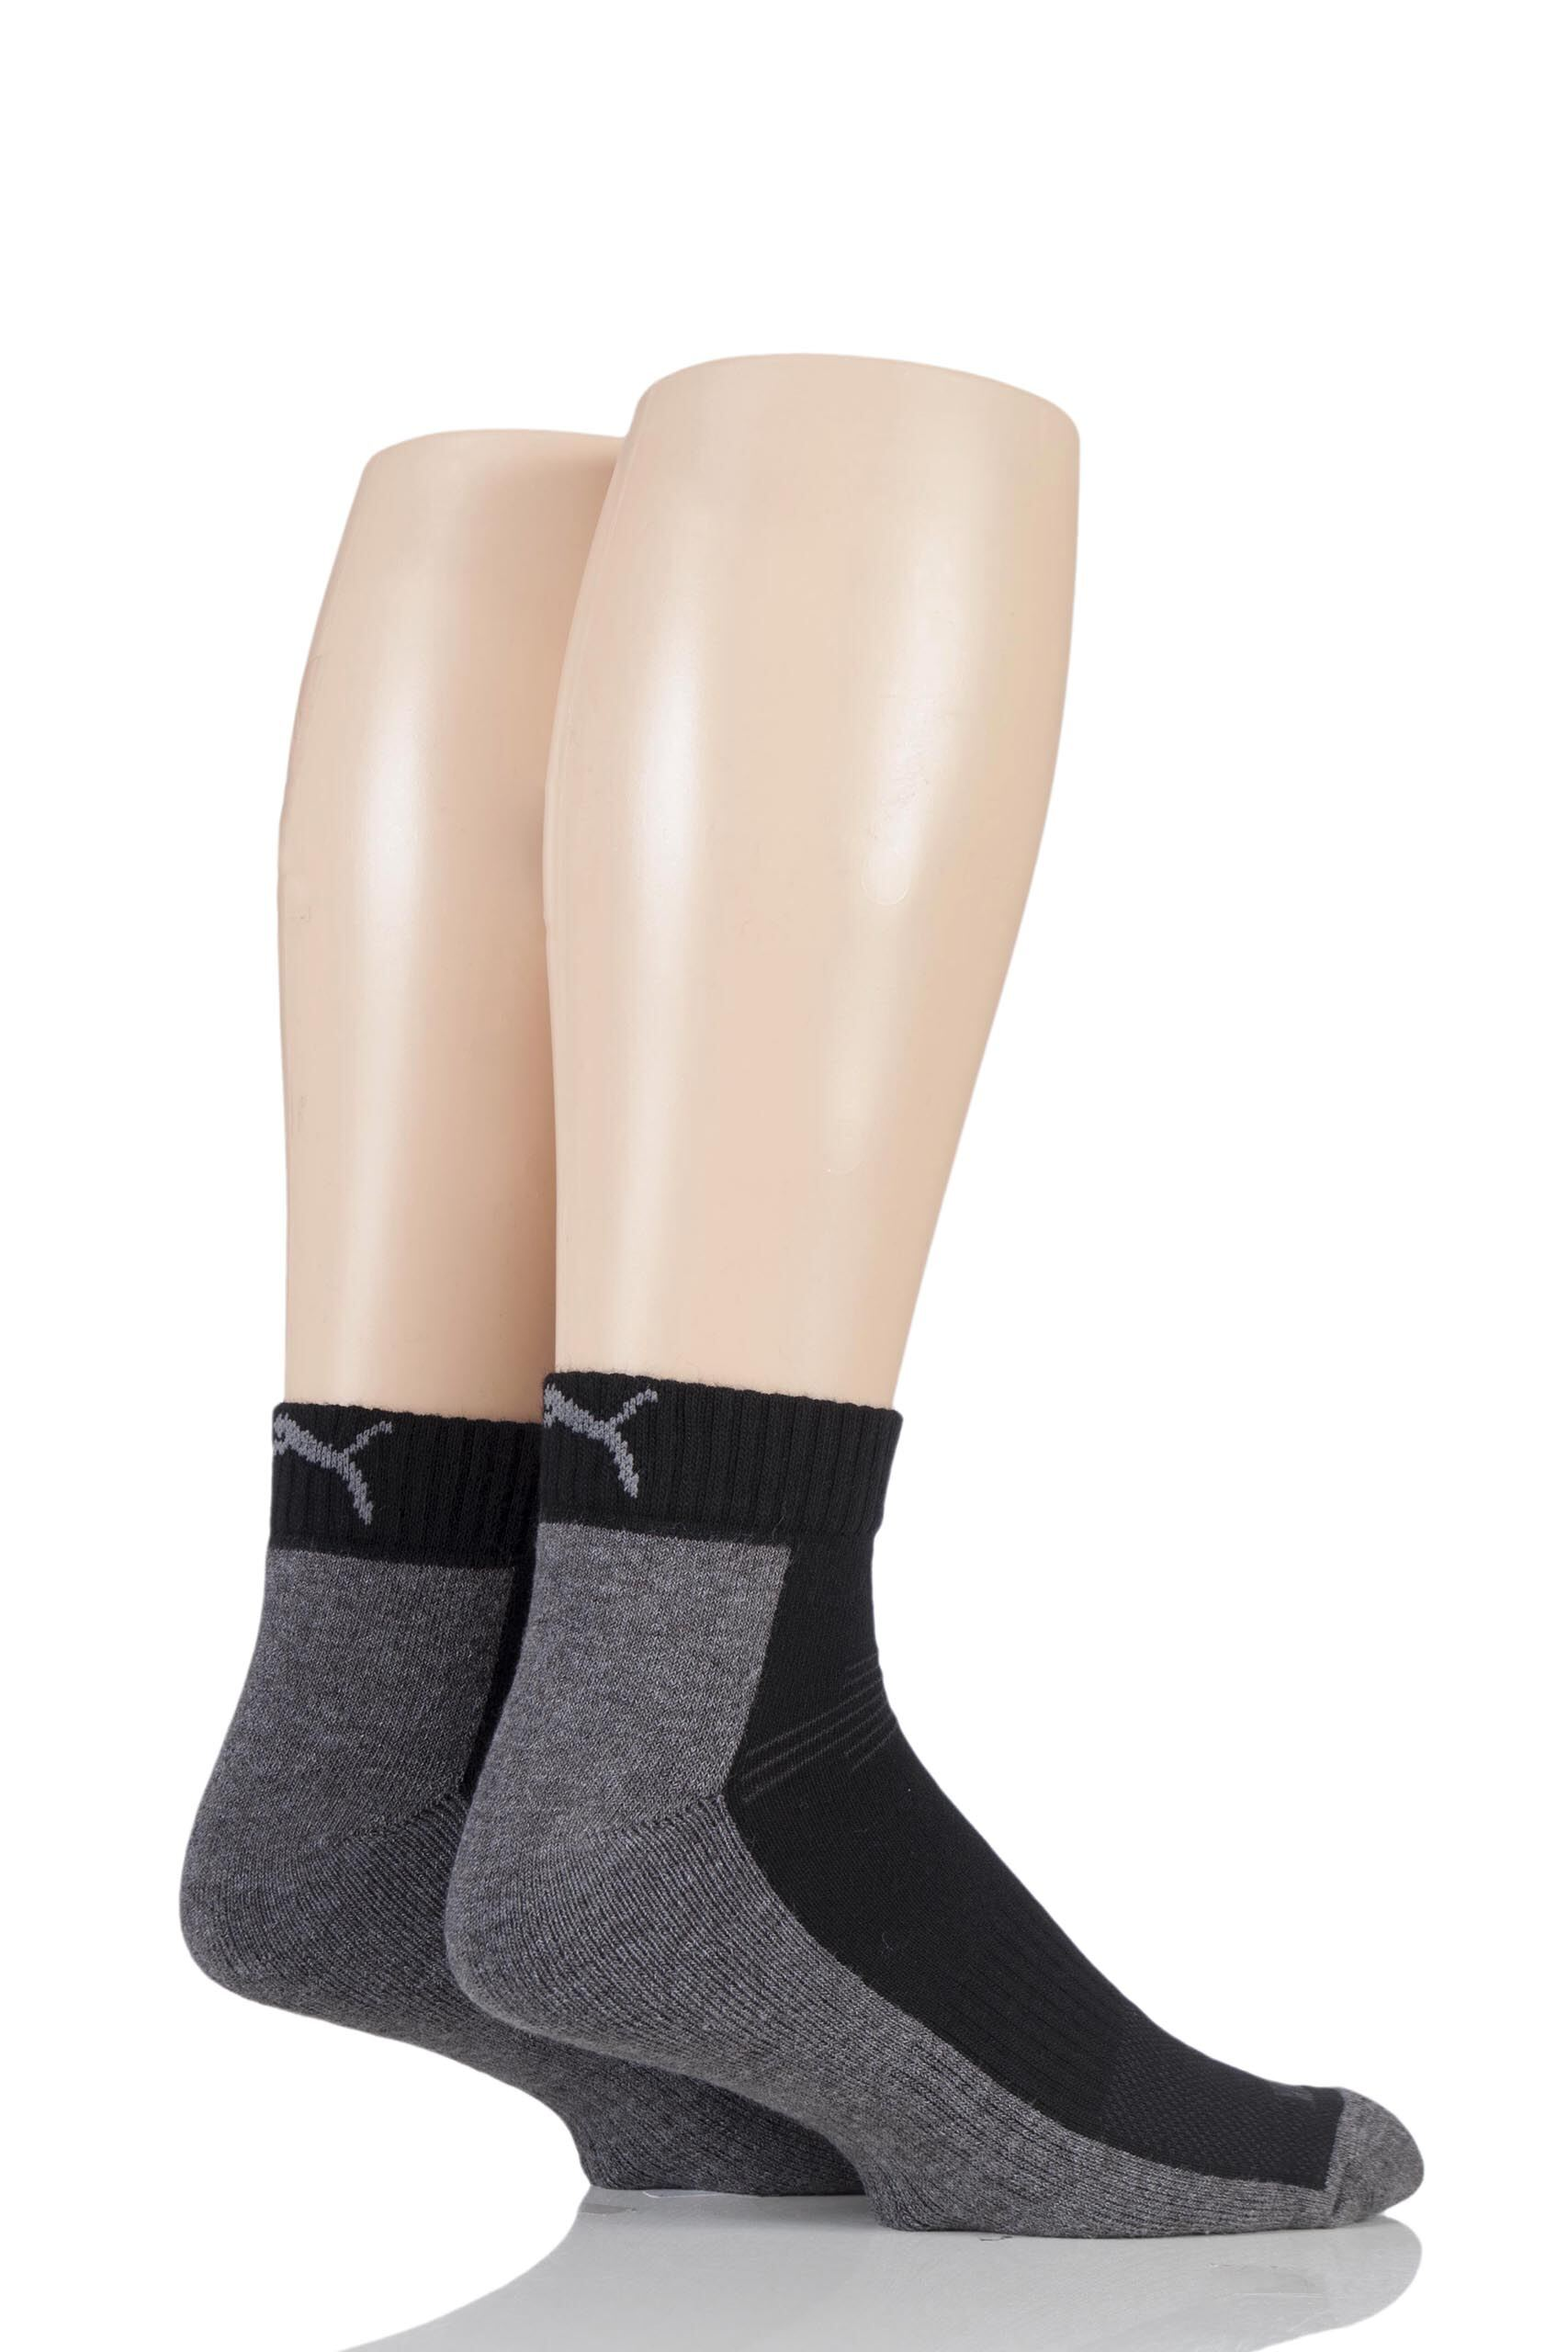 Image of 2 Pair Grey Coolmax Technical Quarter Length Socks Unisex 9-11 Unisex - Puma